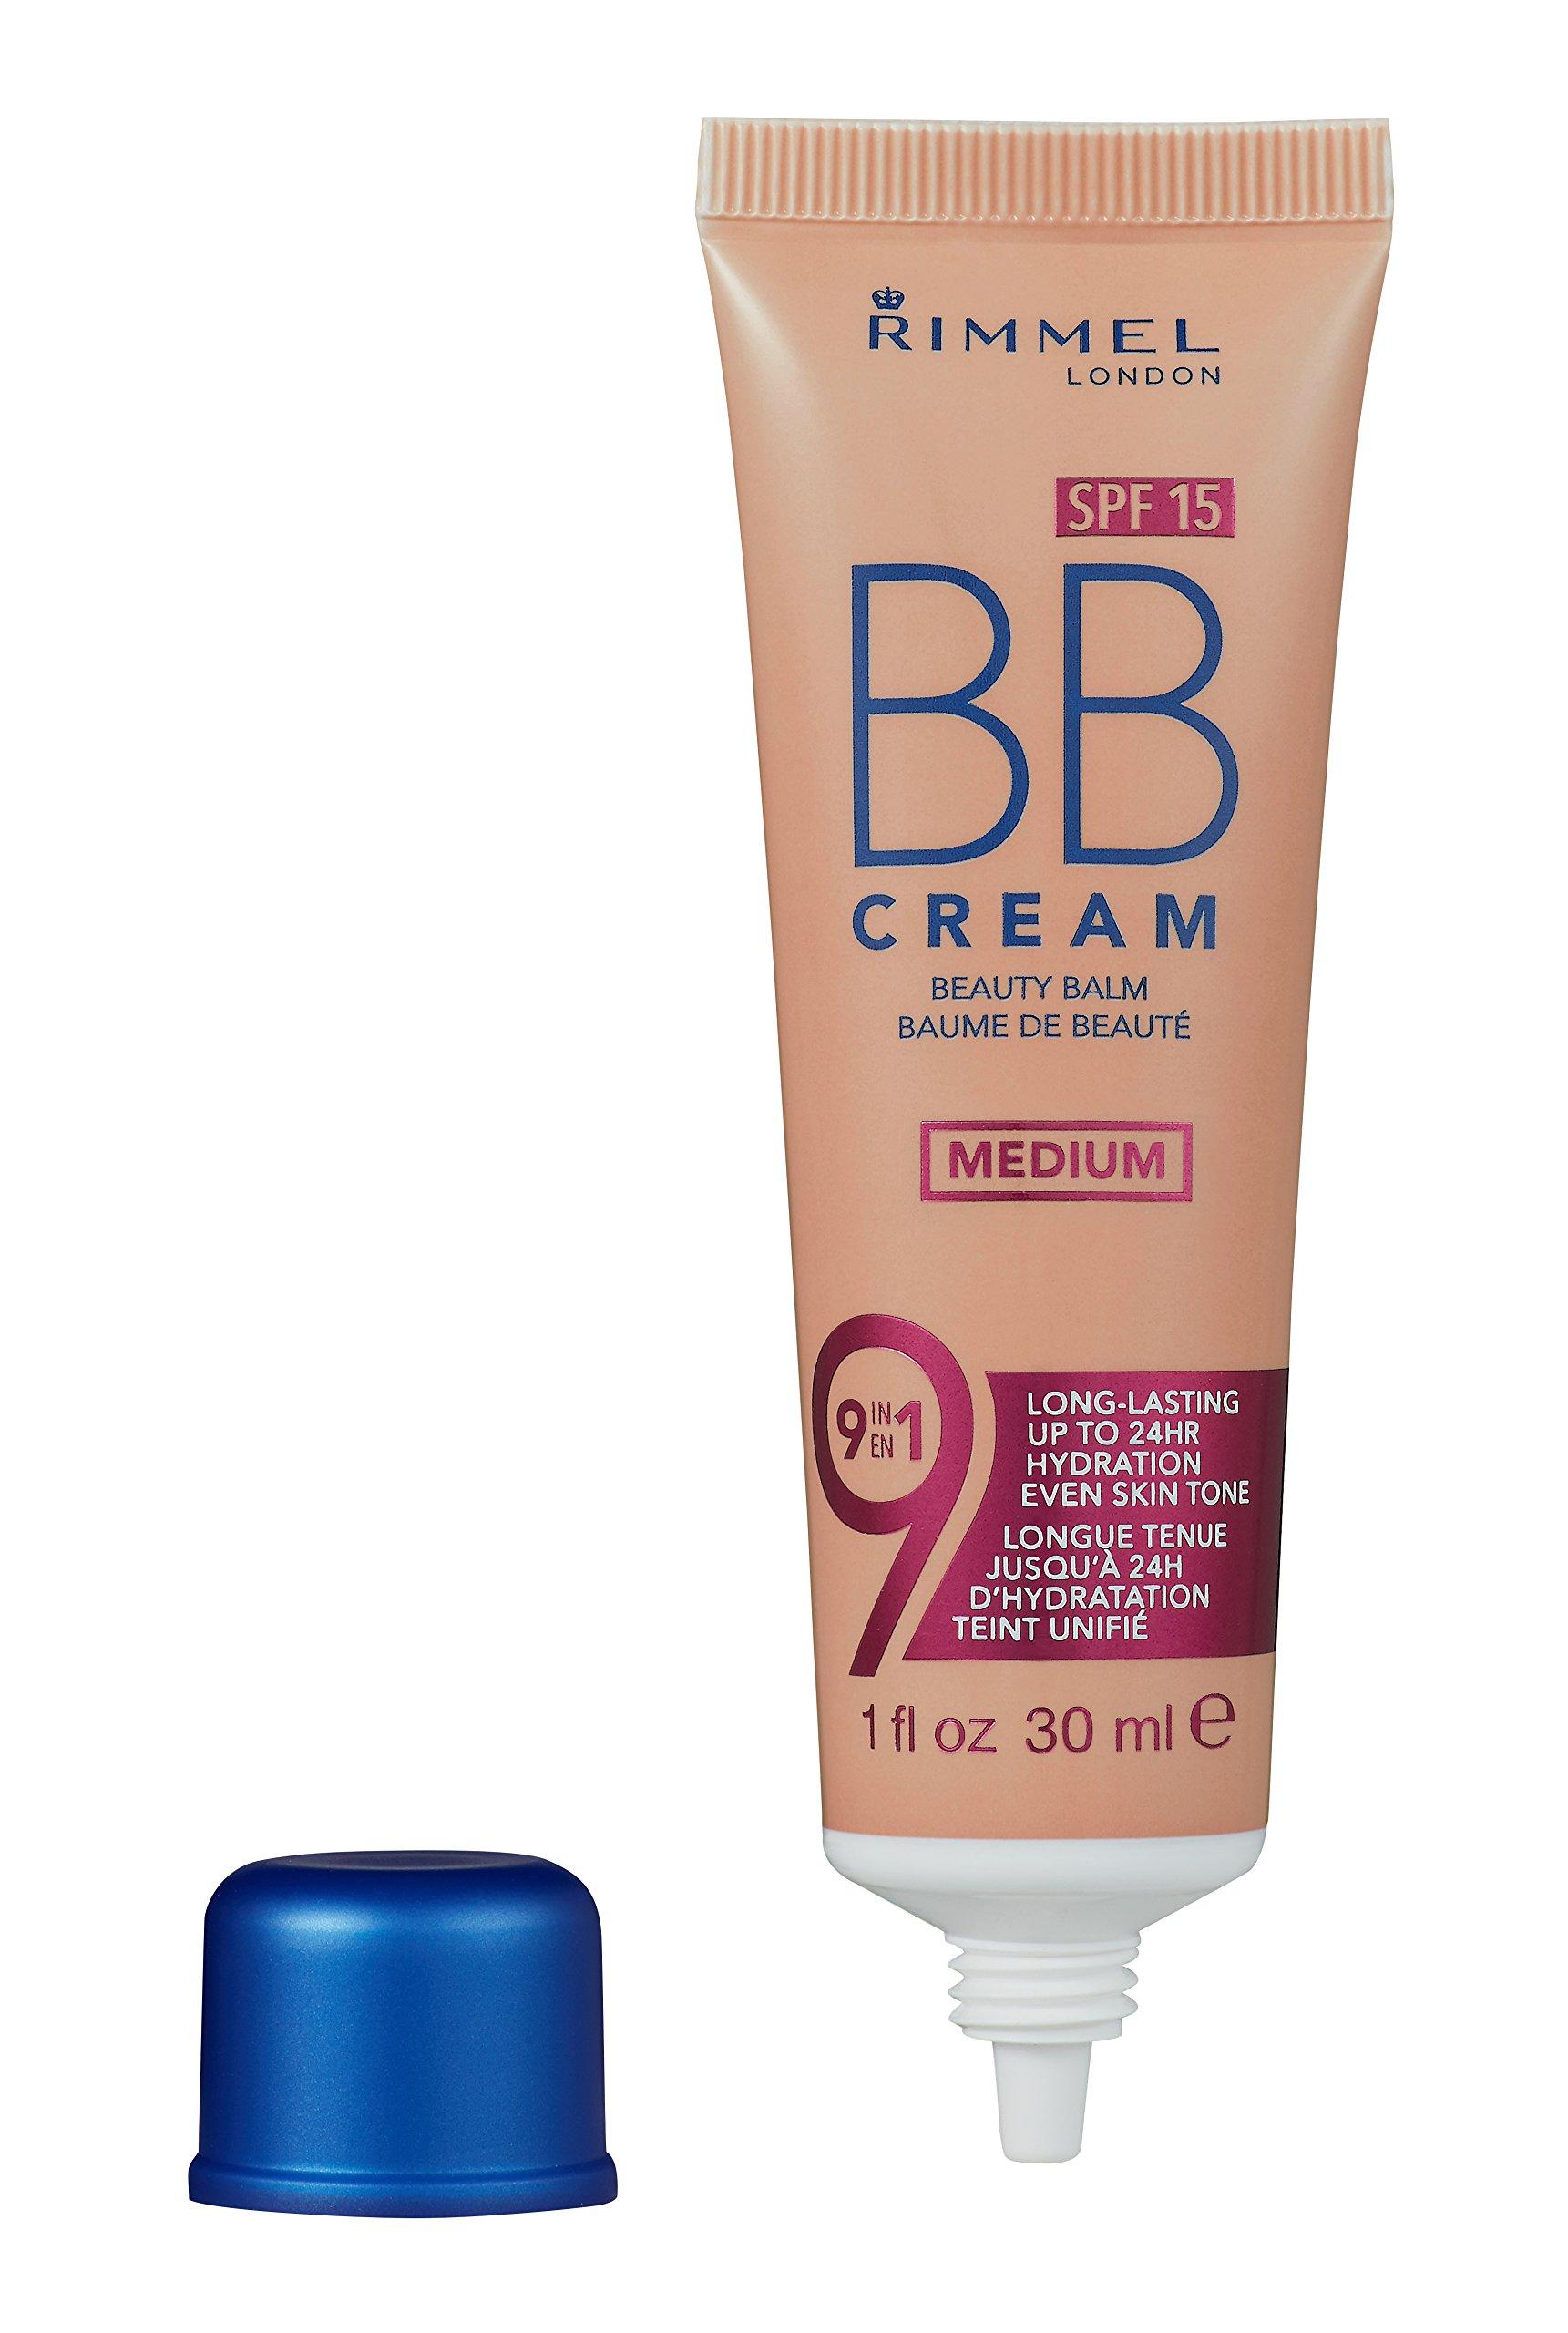 Rimmel London Match Perfection BB Cream Base de Maquillaje Tono 2 Medium - 41 gr product